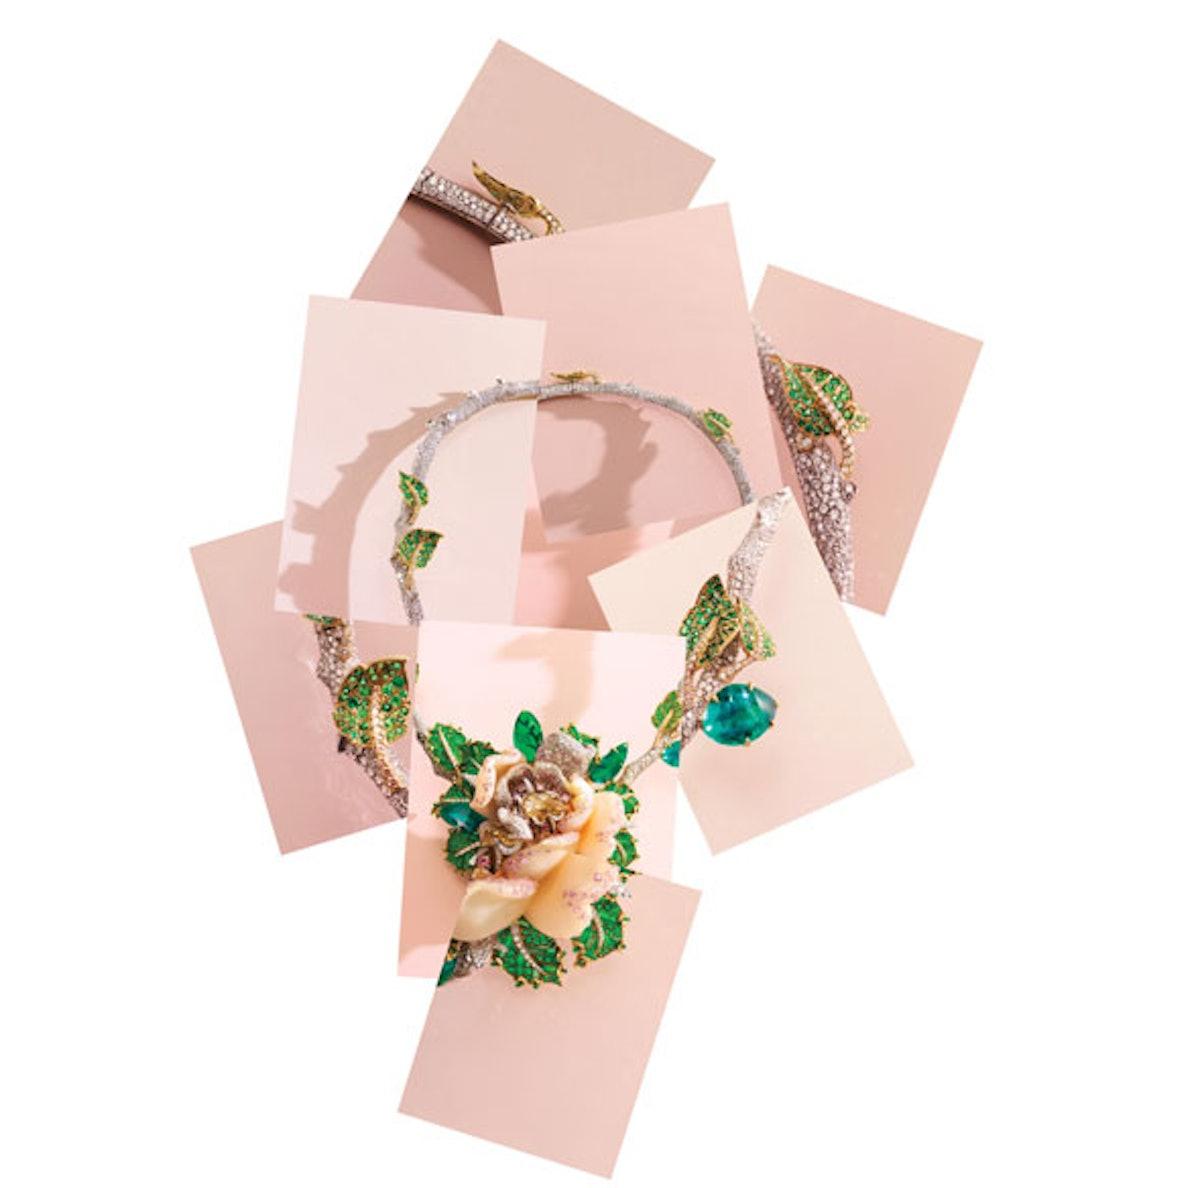 acar-dior-fine-jewelry-v.jpg